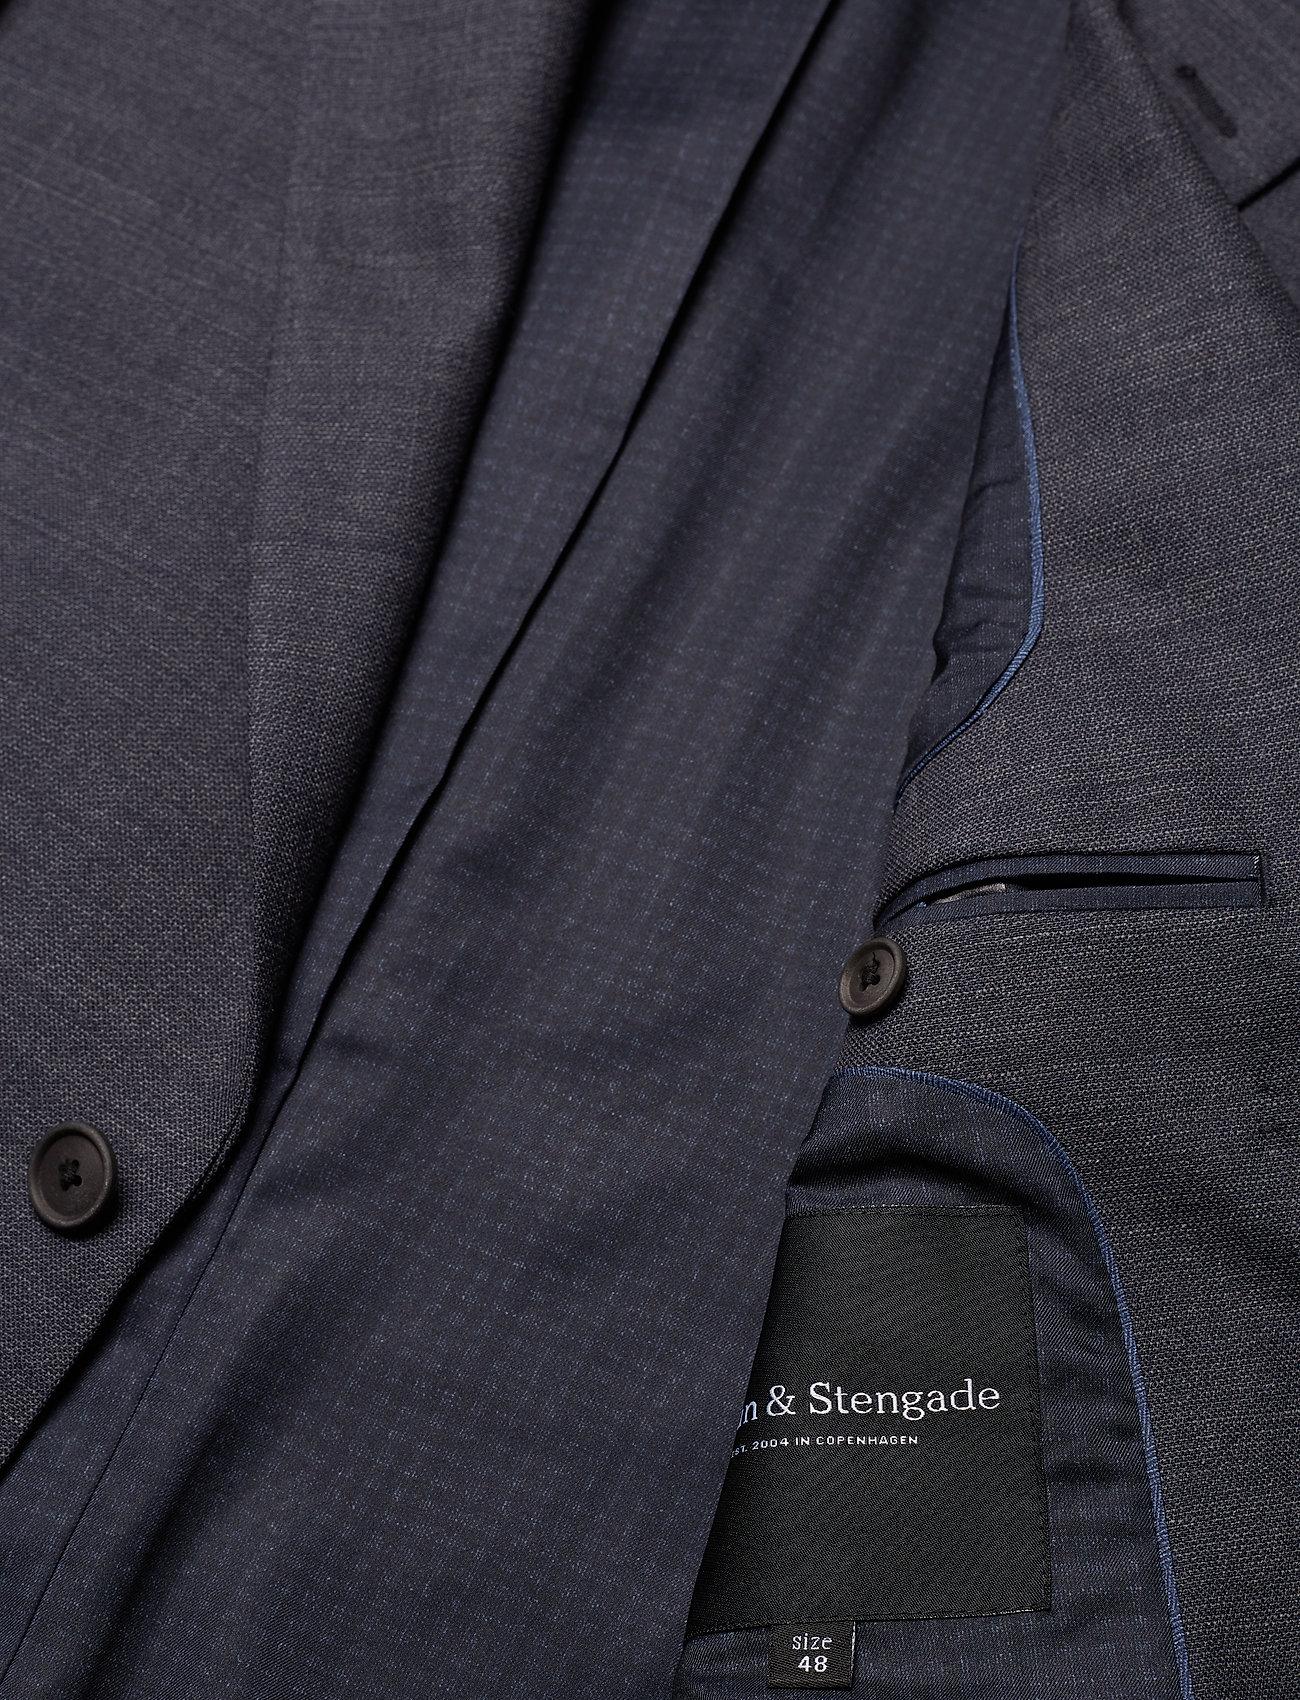 Stengade Rust SlimSuit Setdark Rust Setdark Setdark SlimSuit Stengade SlimSuit Rust GreyBruunamp; GreyBruunamp; LMzpGUqVS